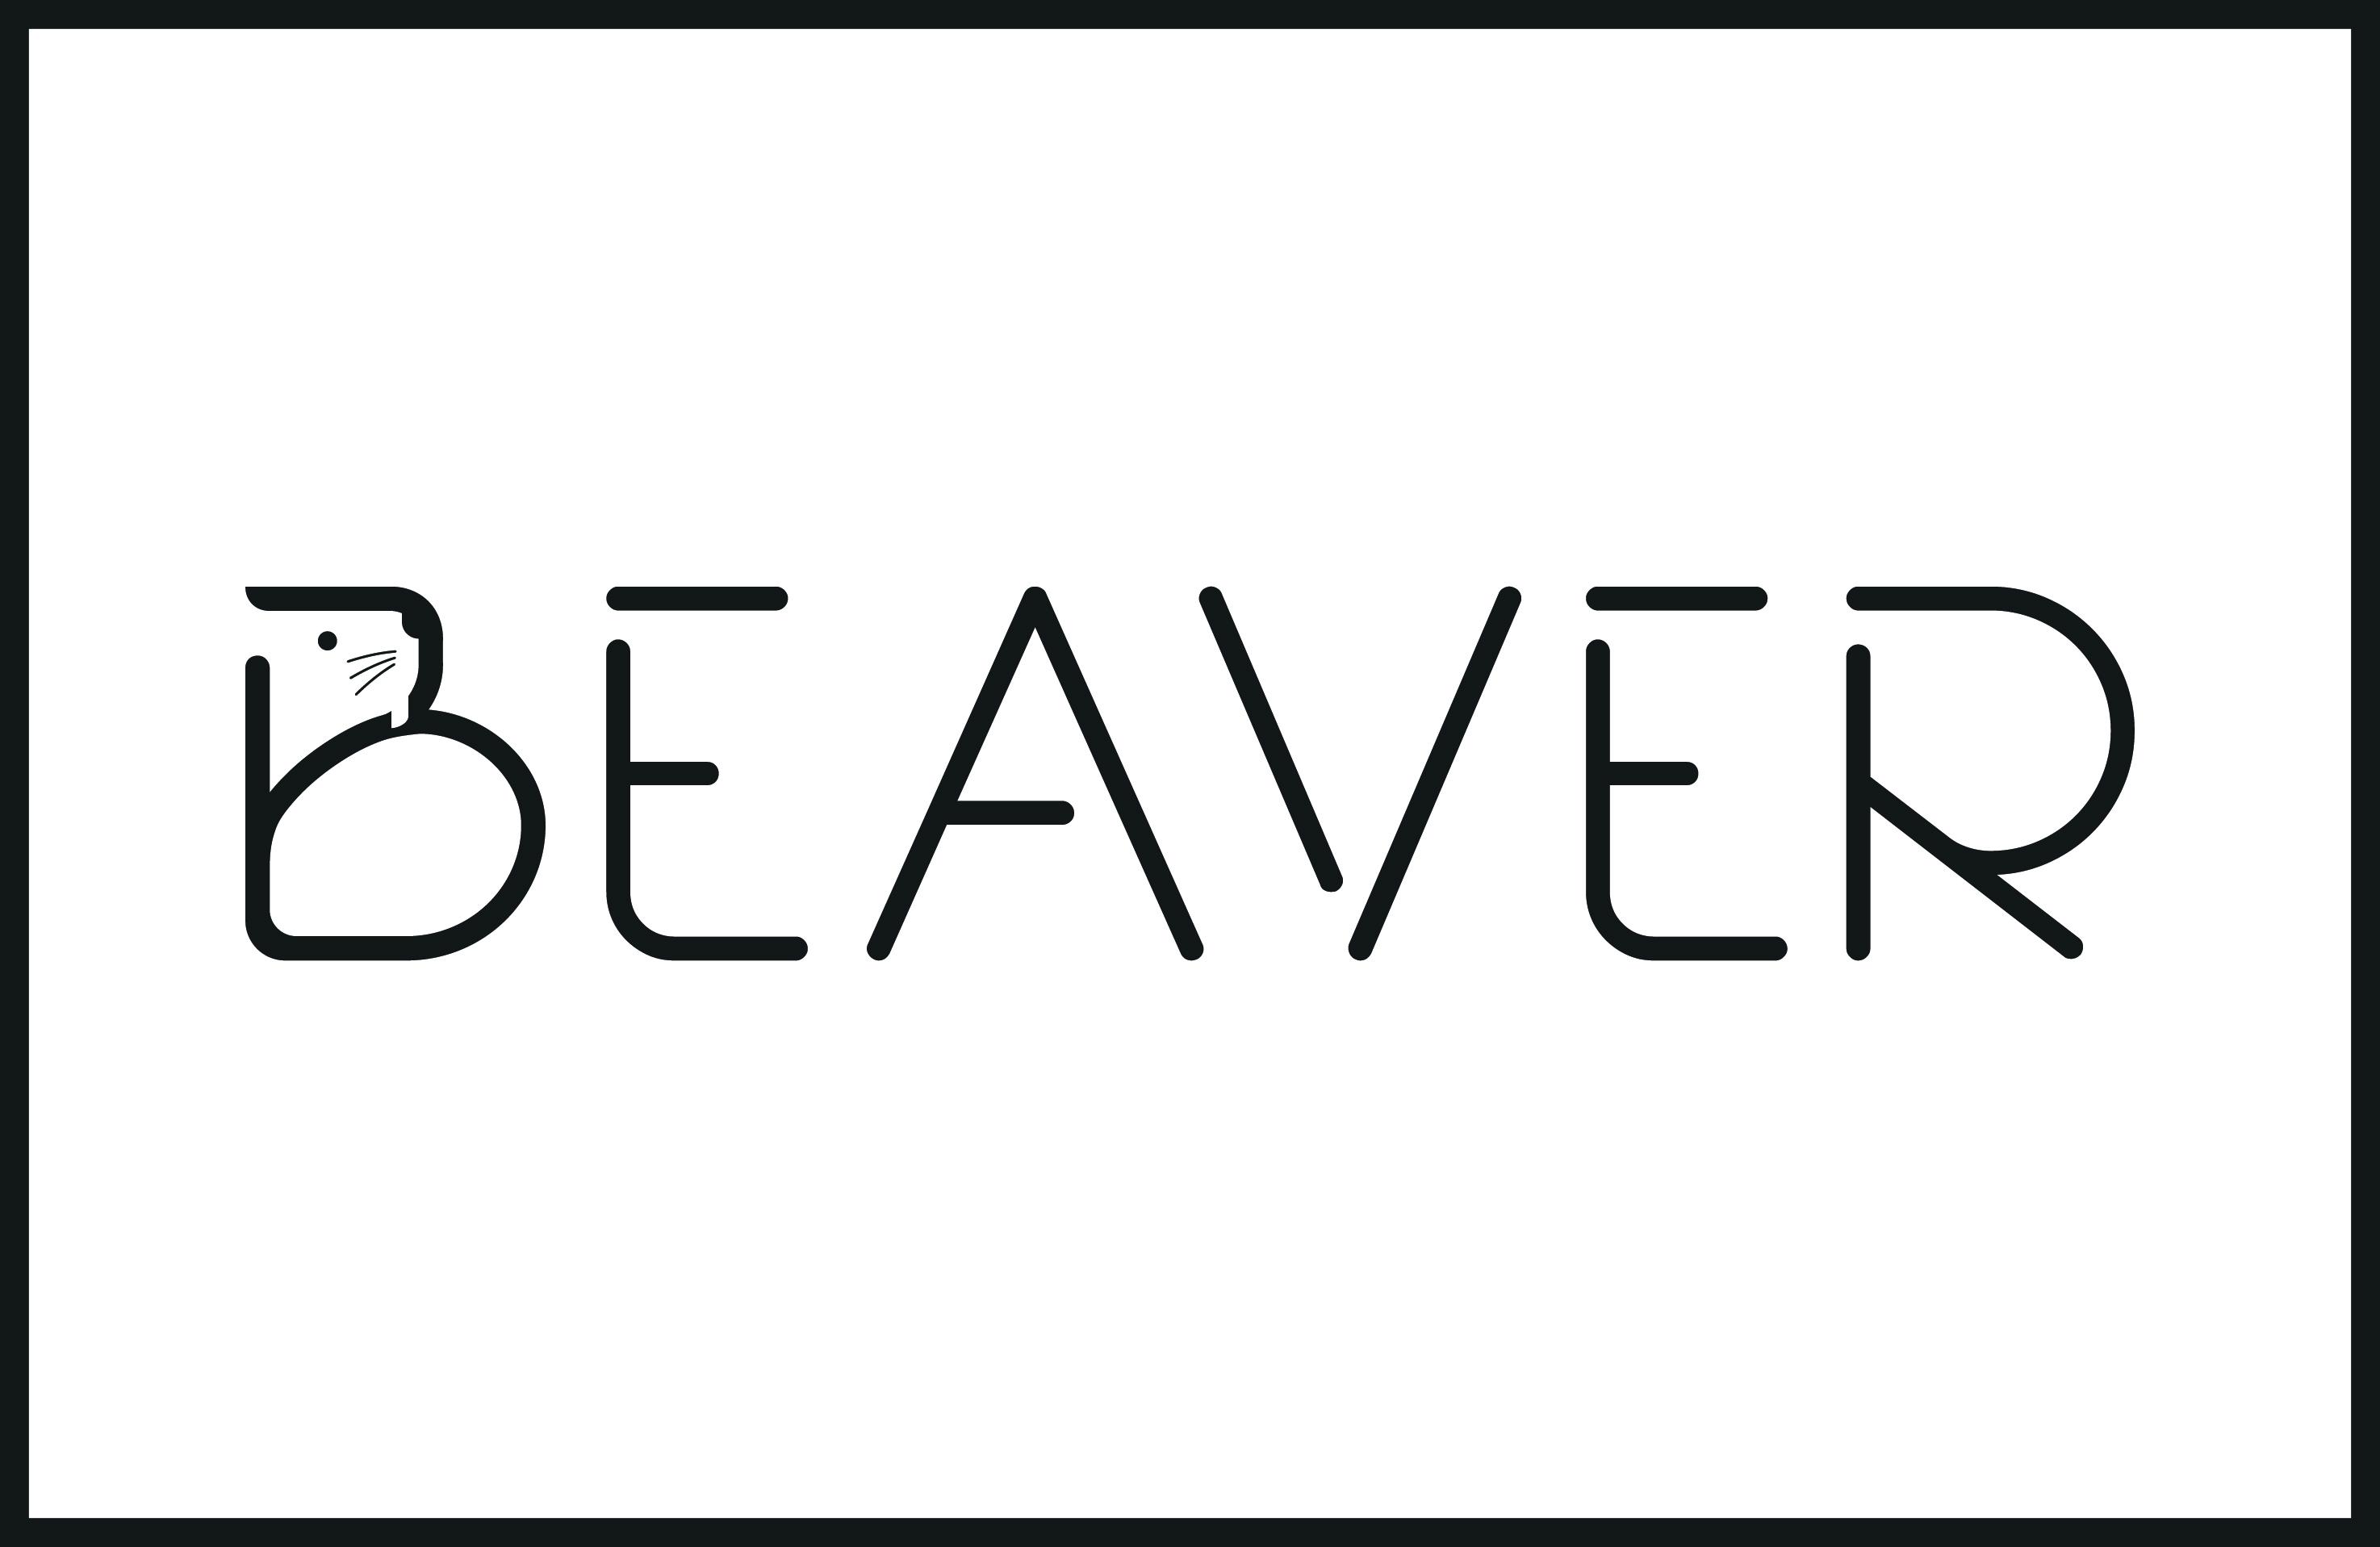 【BEAVER】建築学生に必要な全てがひとつのサービスに。